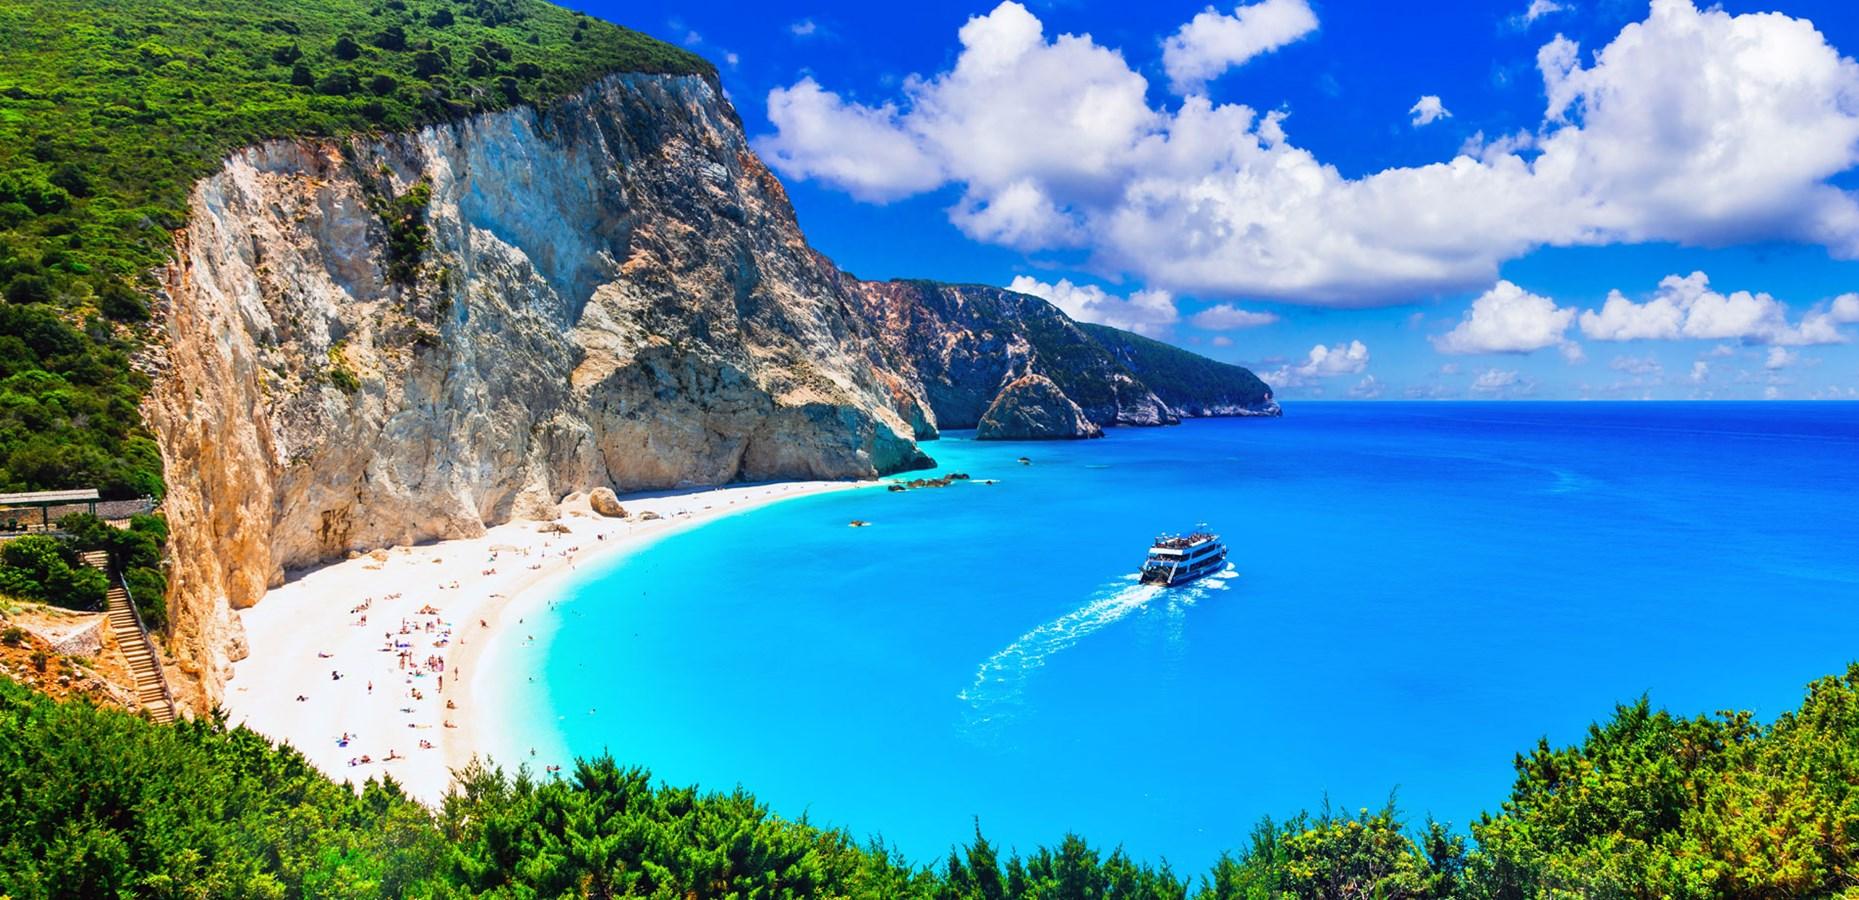 Super Reducere Early Booking Sejur Individual Grecia - Lefkada Hotel Vergina Star 3 * Iunie - August 5 nopti de la doar 119 Euro/persoana!